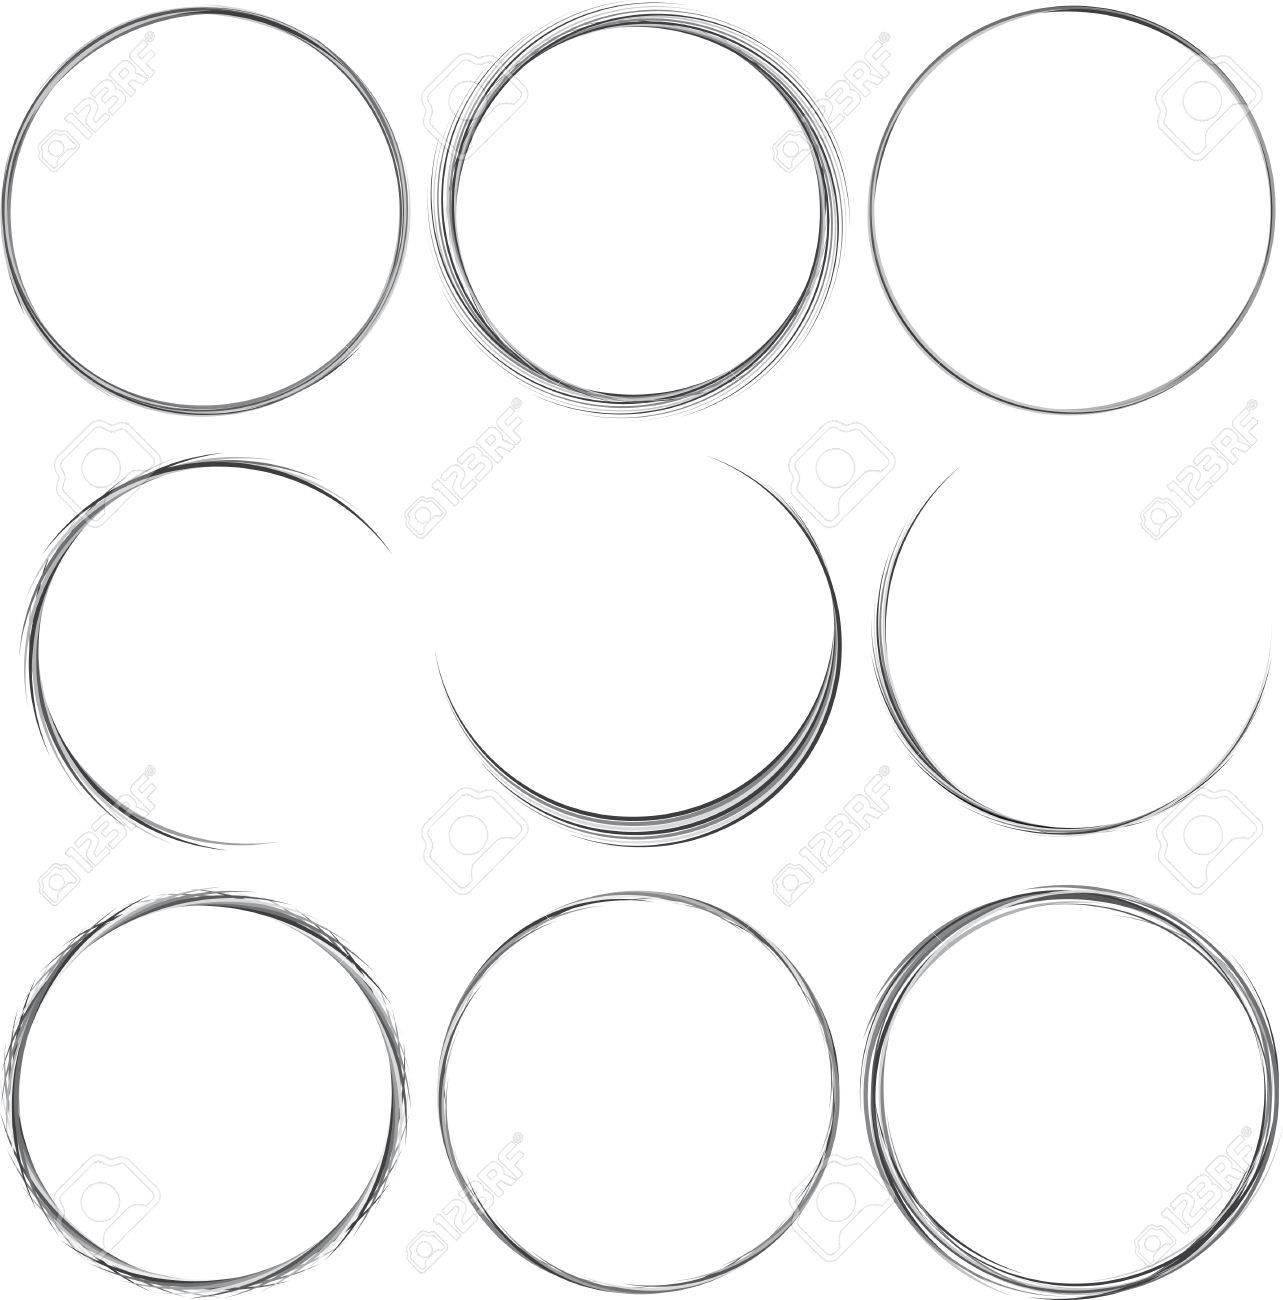 Set Of Round Elements For Design. Frame, Border. Royalty Free ...